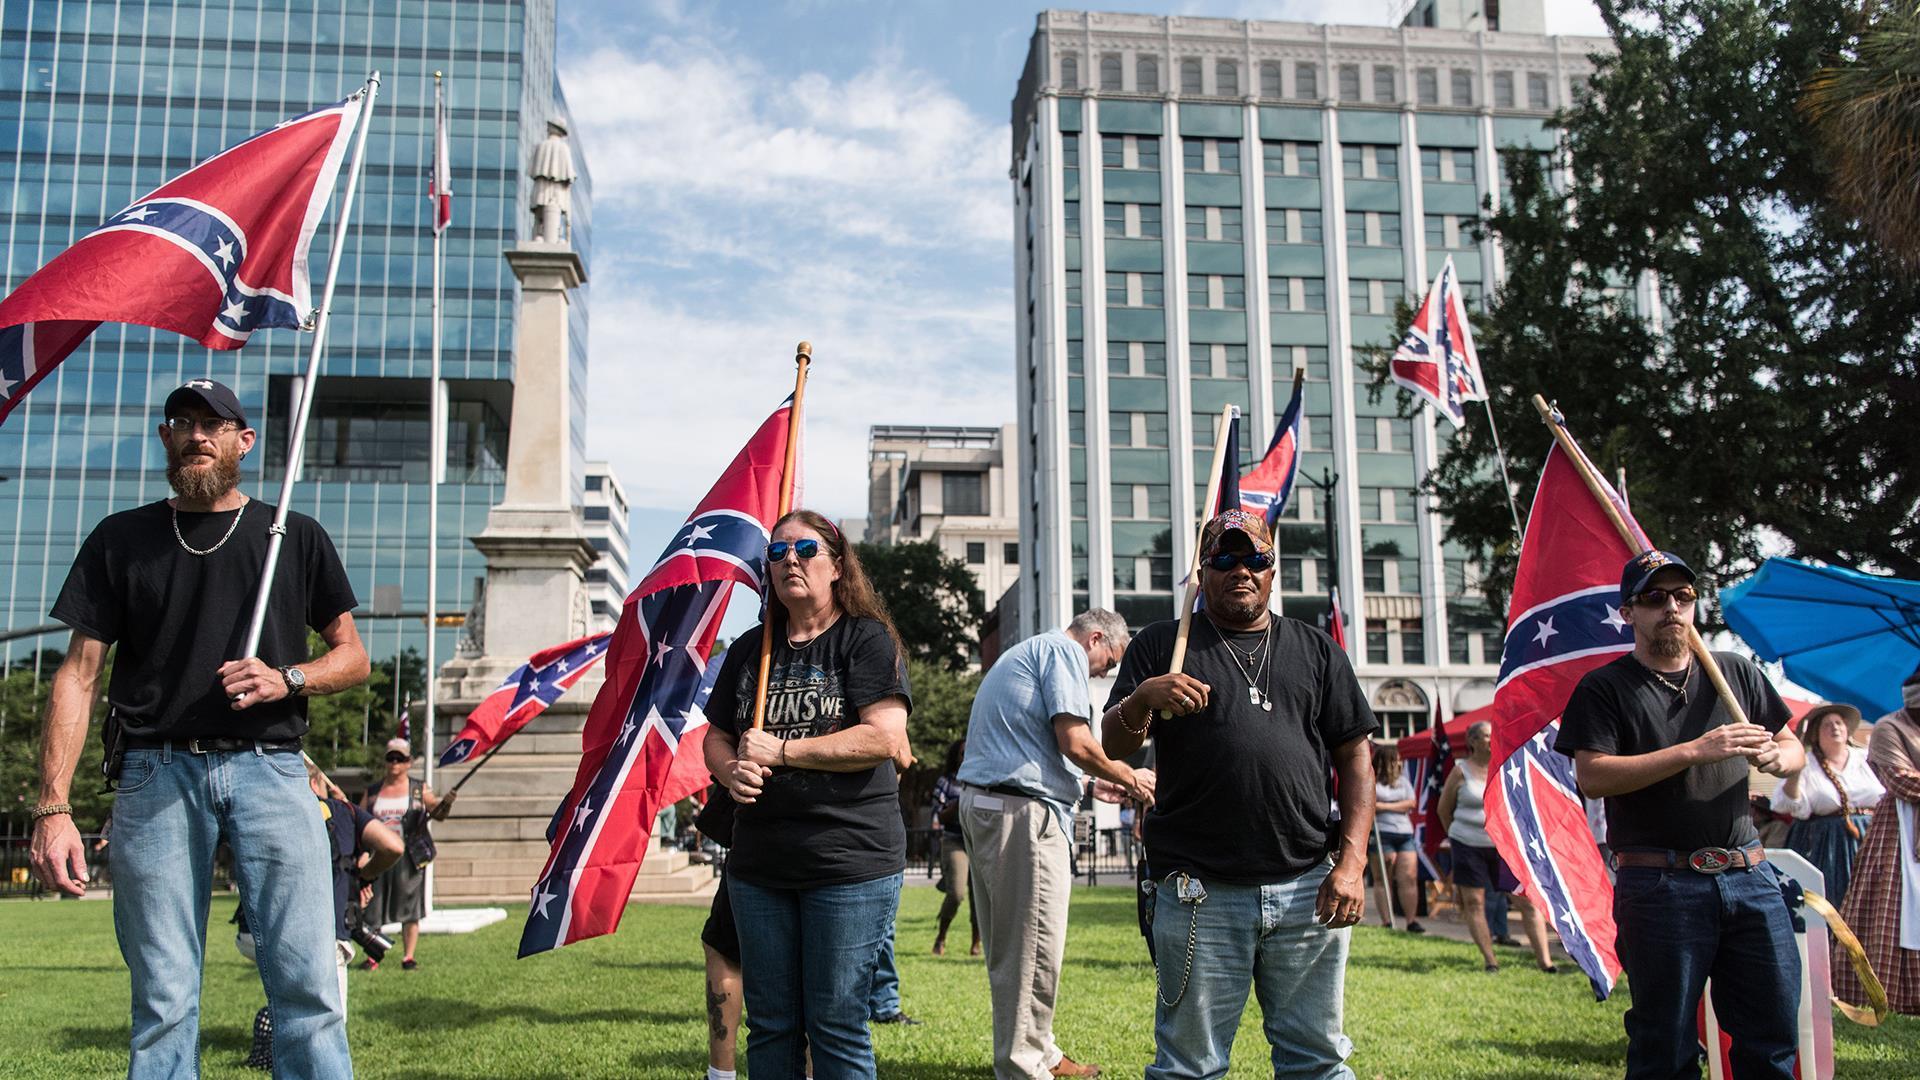 Richmond City Hall Raises Pride Flag, Protests Erupt